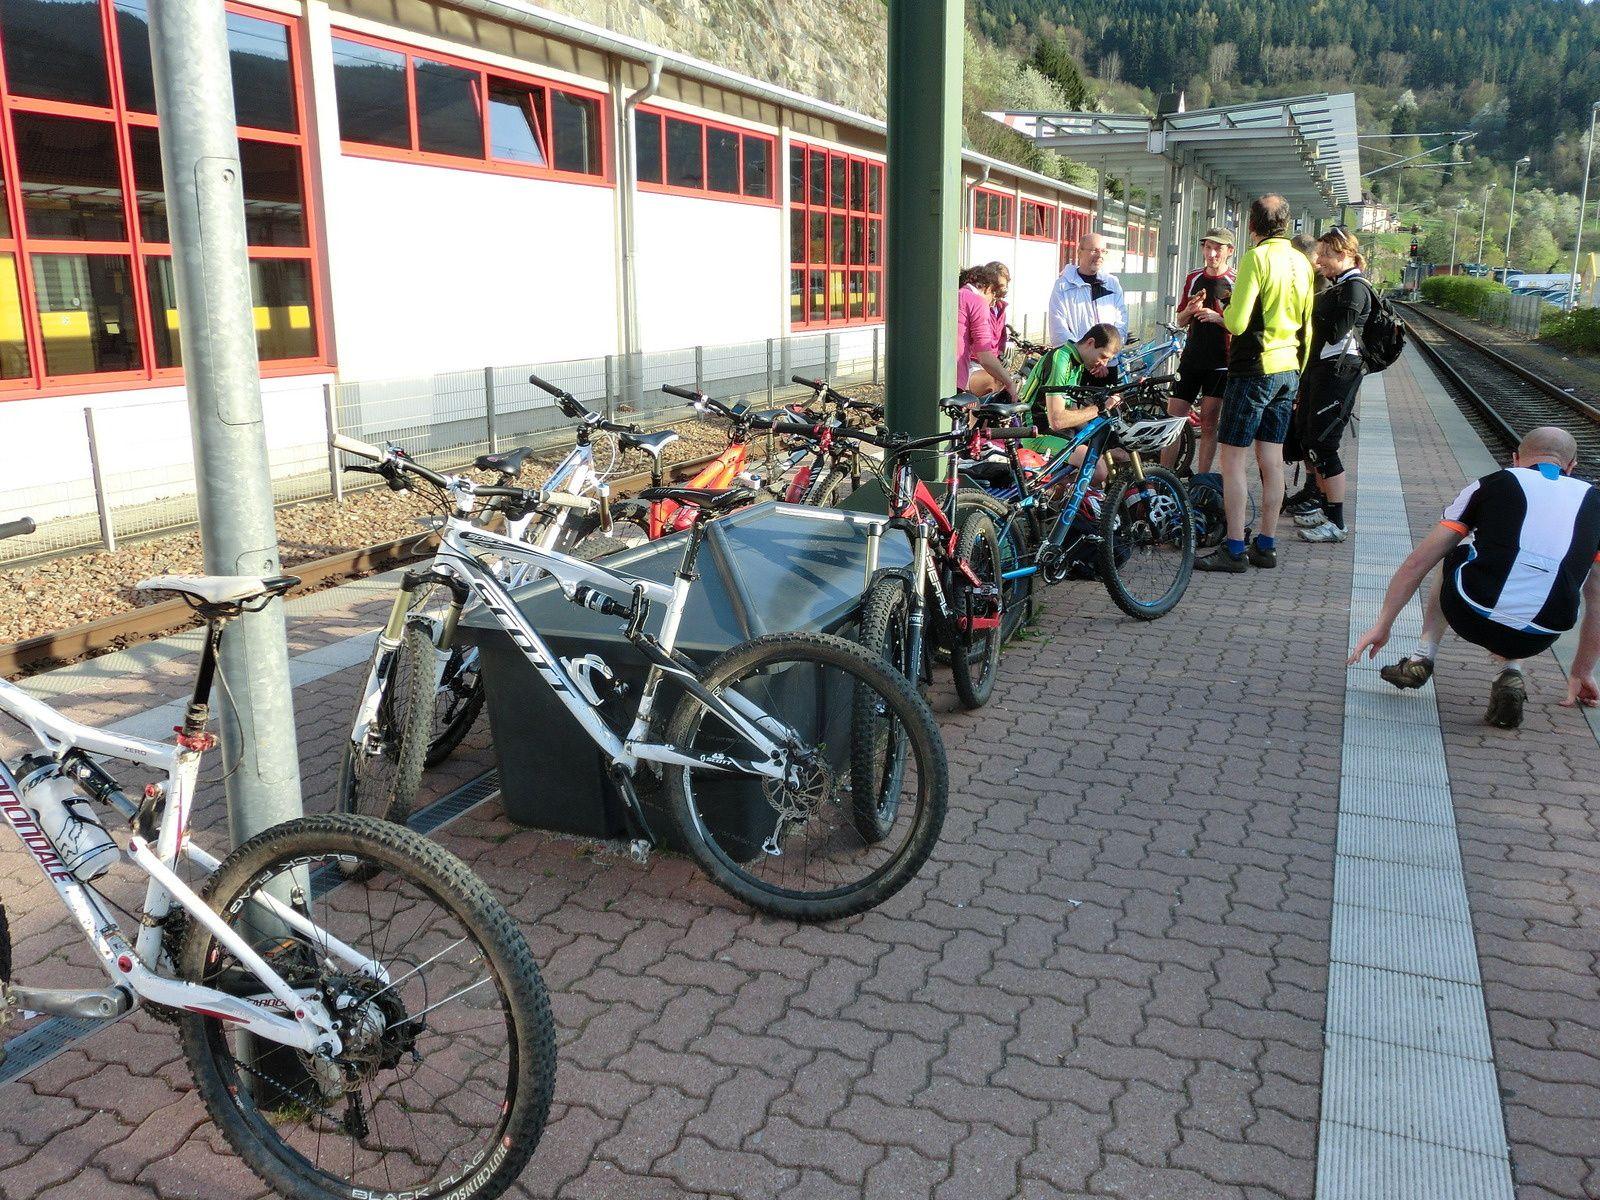 VTT Schwarzenbach Stausee - 6 avril 2014